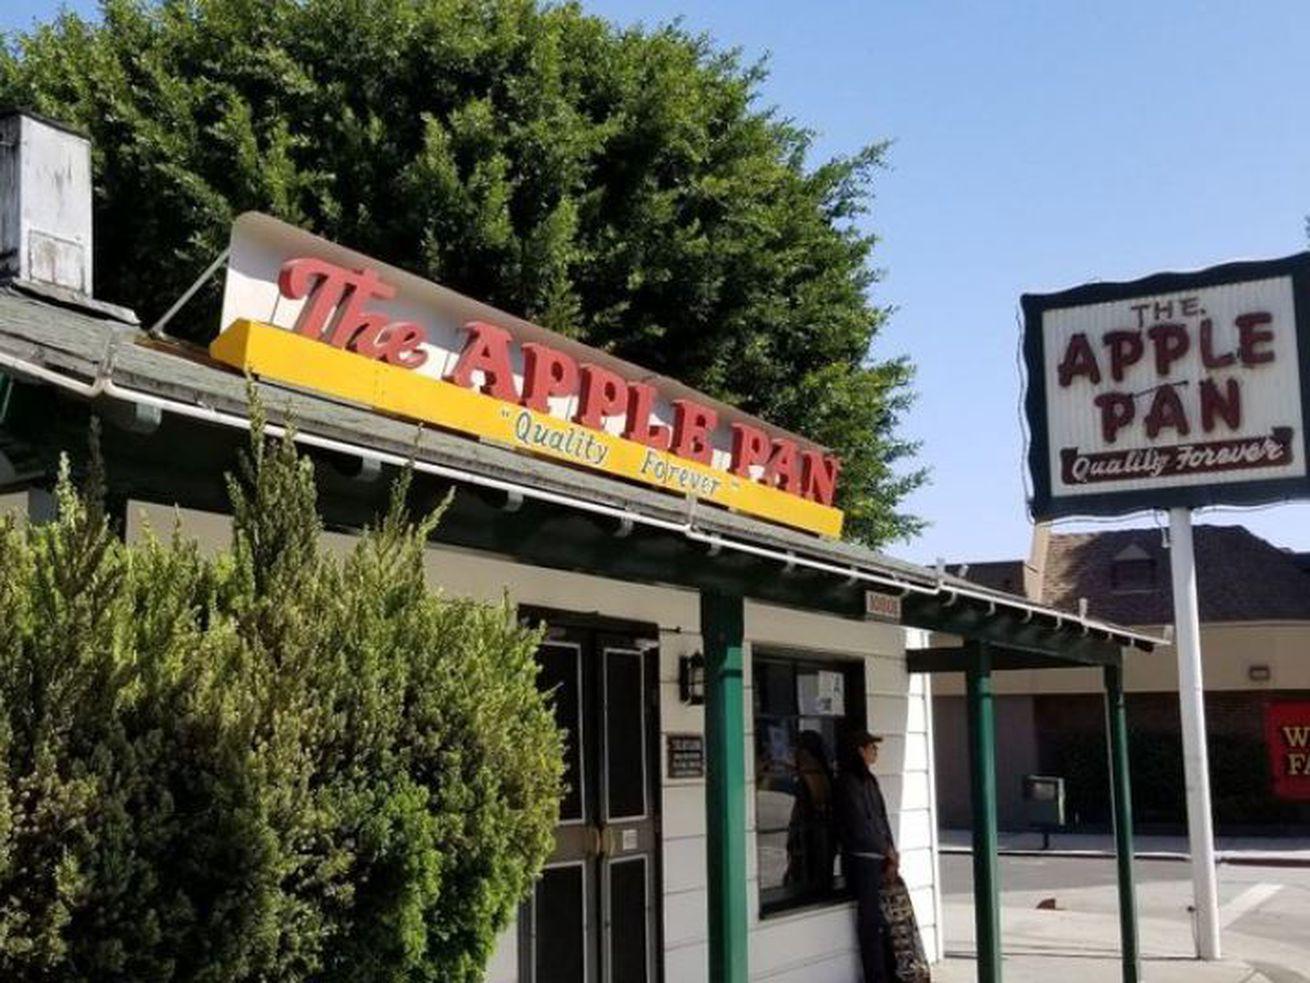 Outside The Apple Pan, West LA